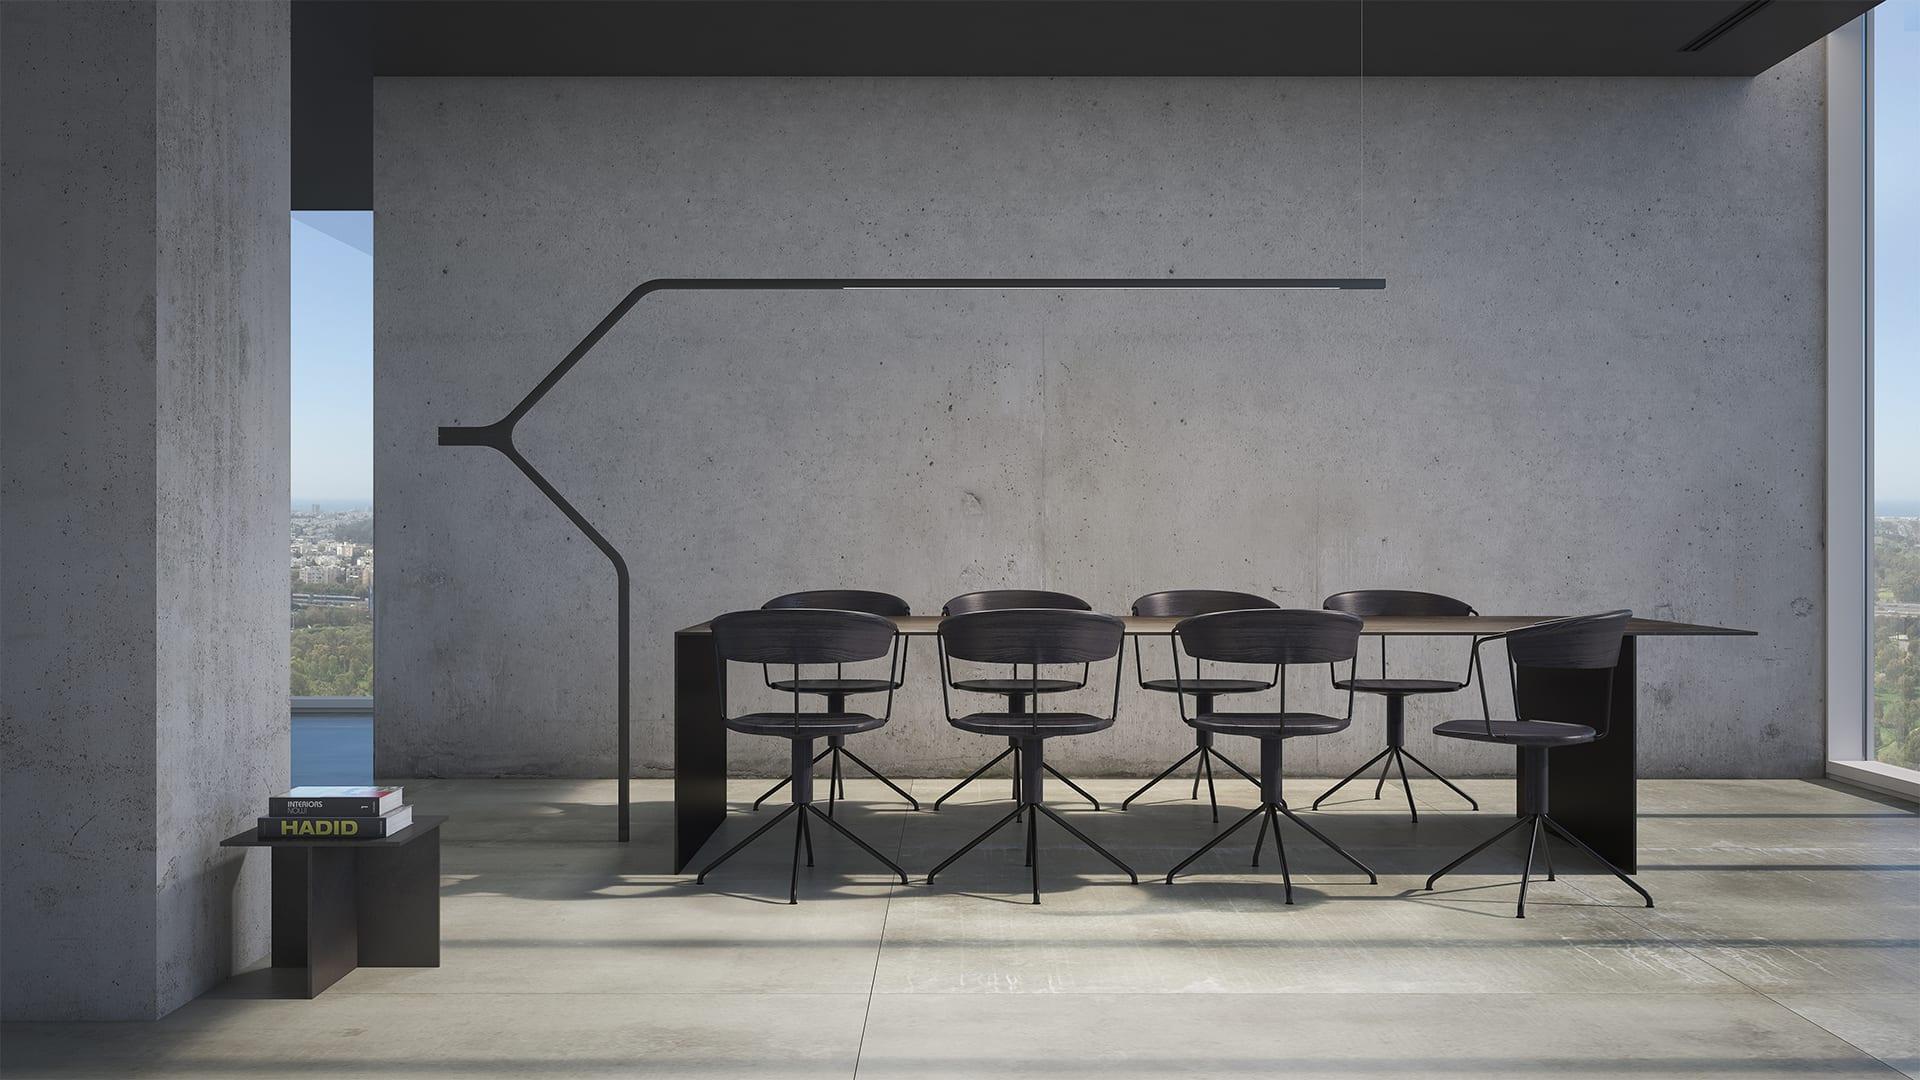 Maayan-Golan_Architectural-Visualization_product-visualization_wall-tiles_lighting-fixture_itai-bar-on_metting-room_04